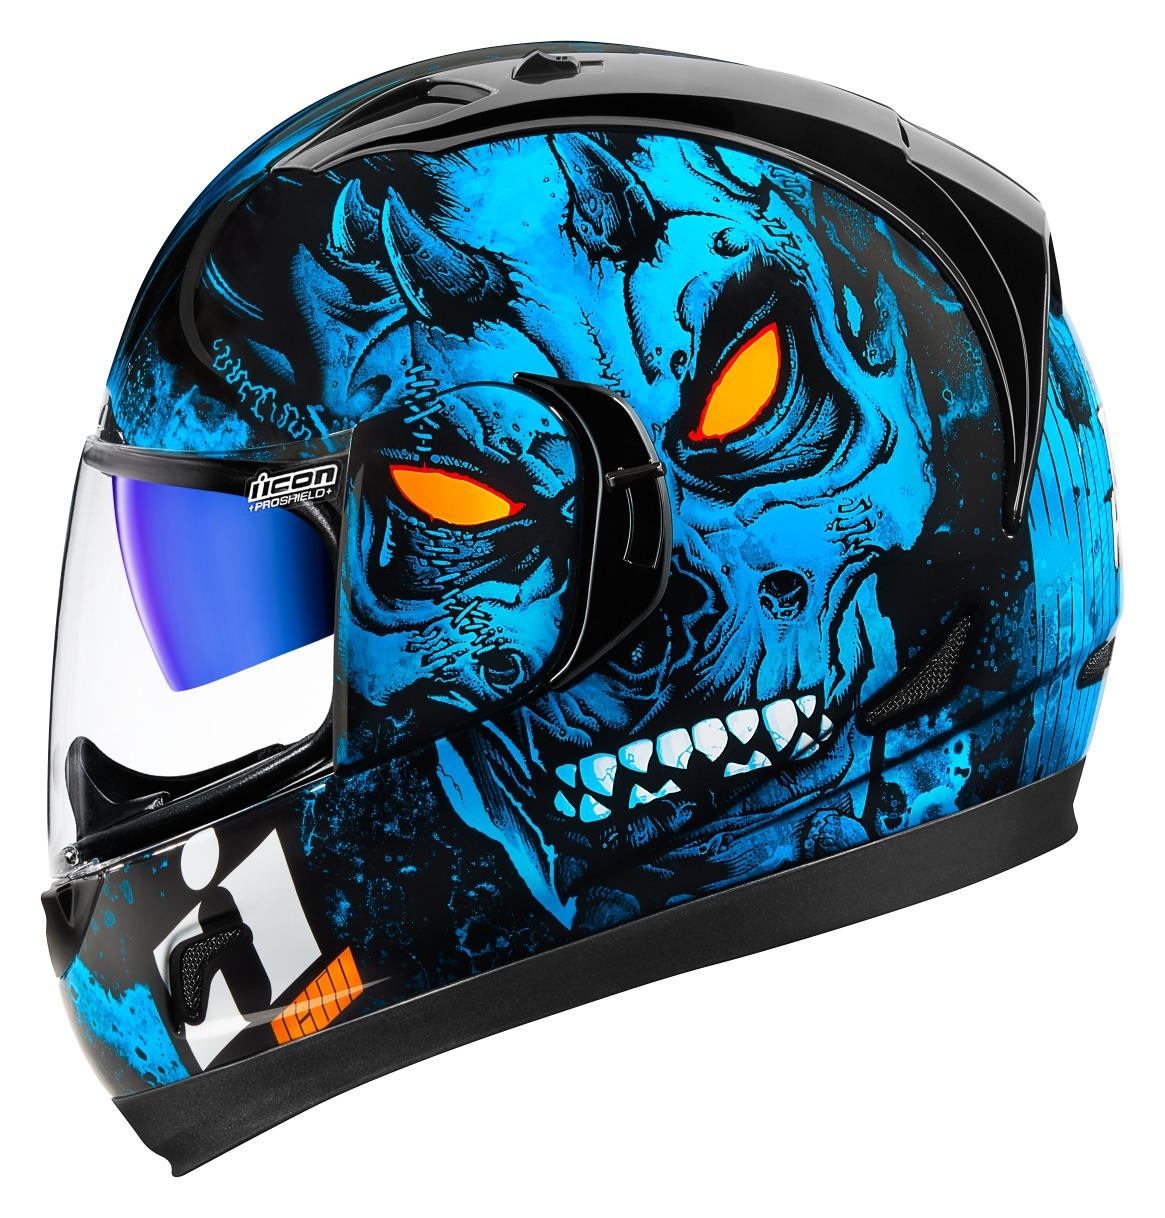 Icon Alliance GT Horror Helmet RevZilla - Motorcycle helmet decals graphicsmotorcycle helmet graphics the easy helmet upgrade